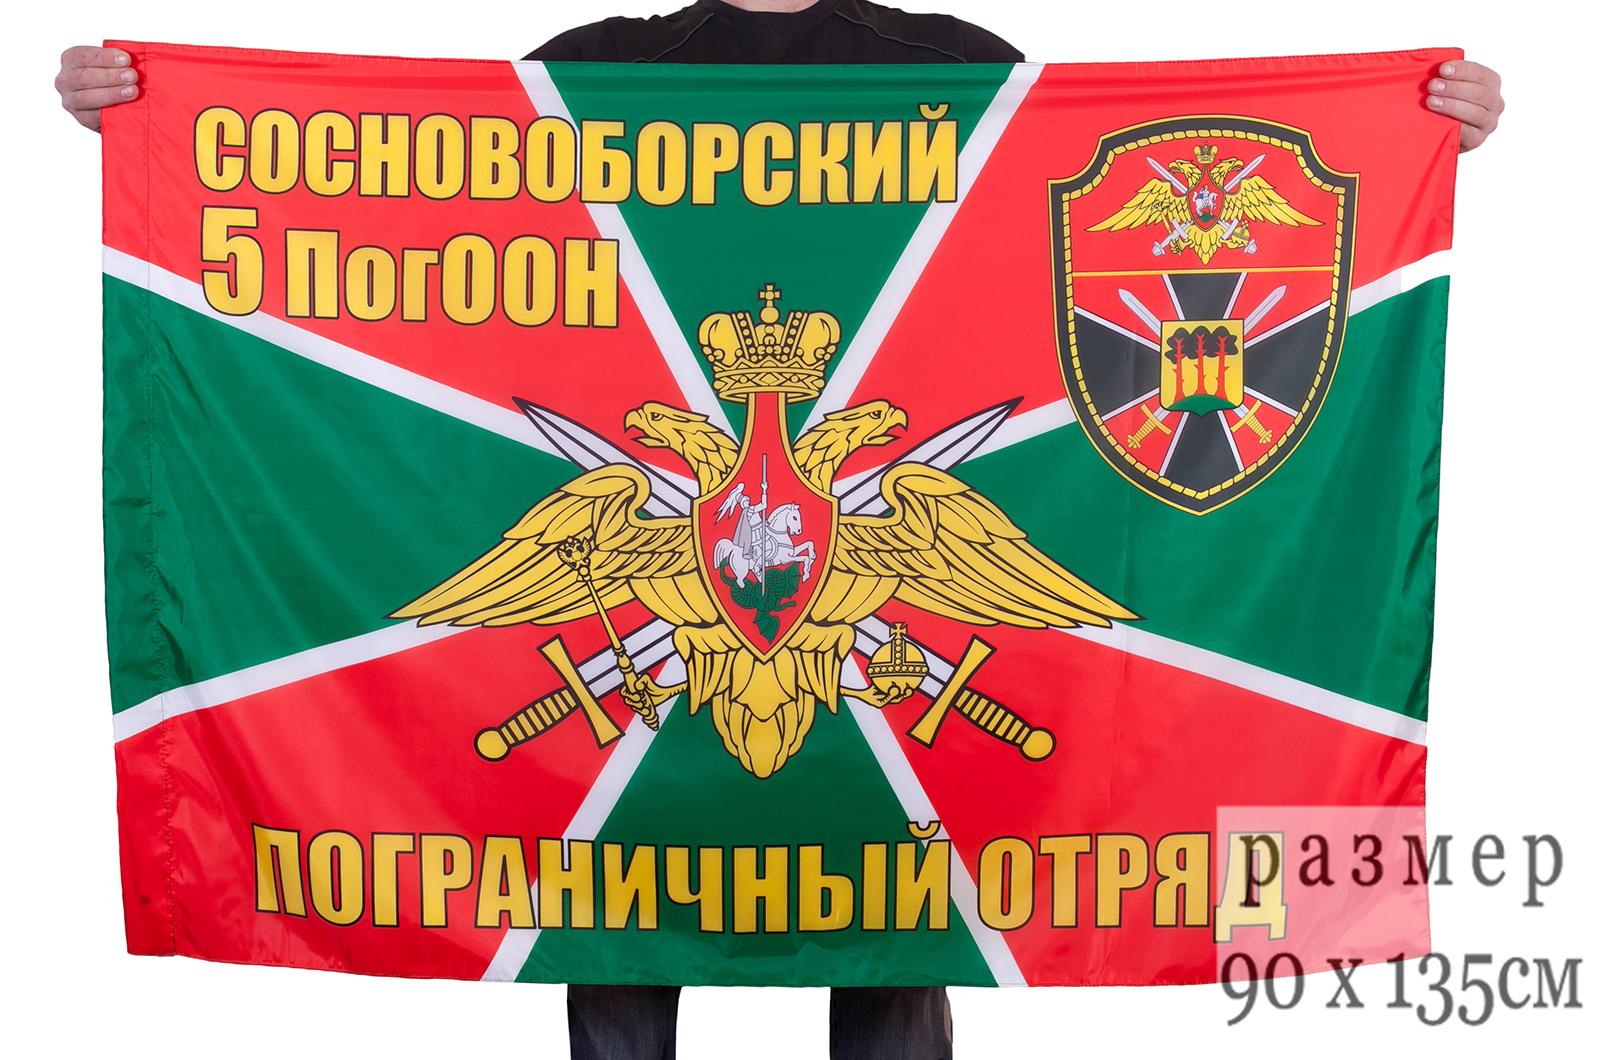 Флаг Сосновоборского 5 ПогООН